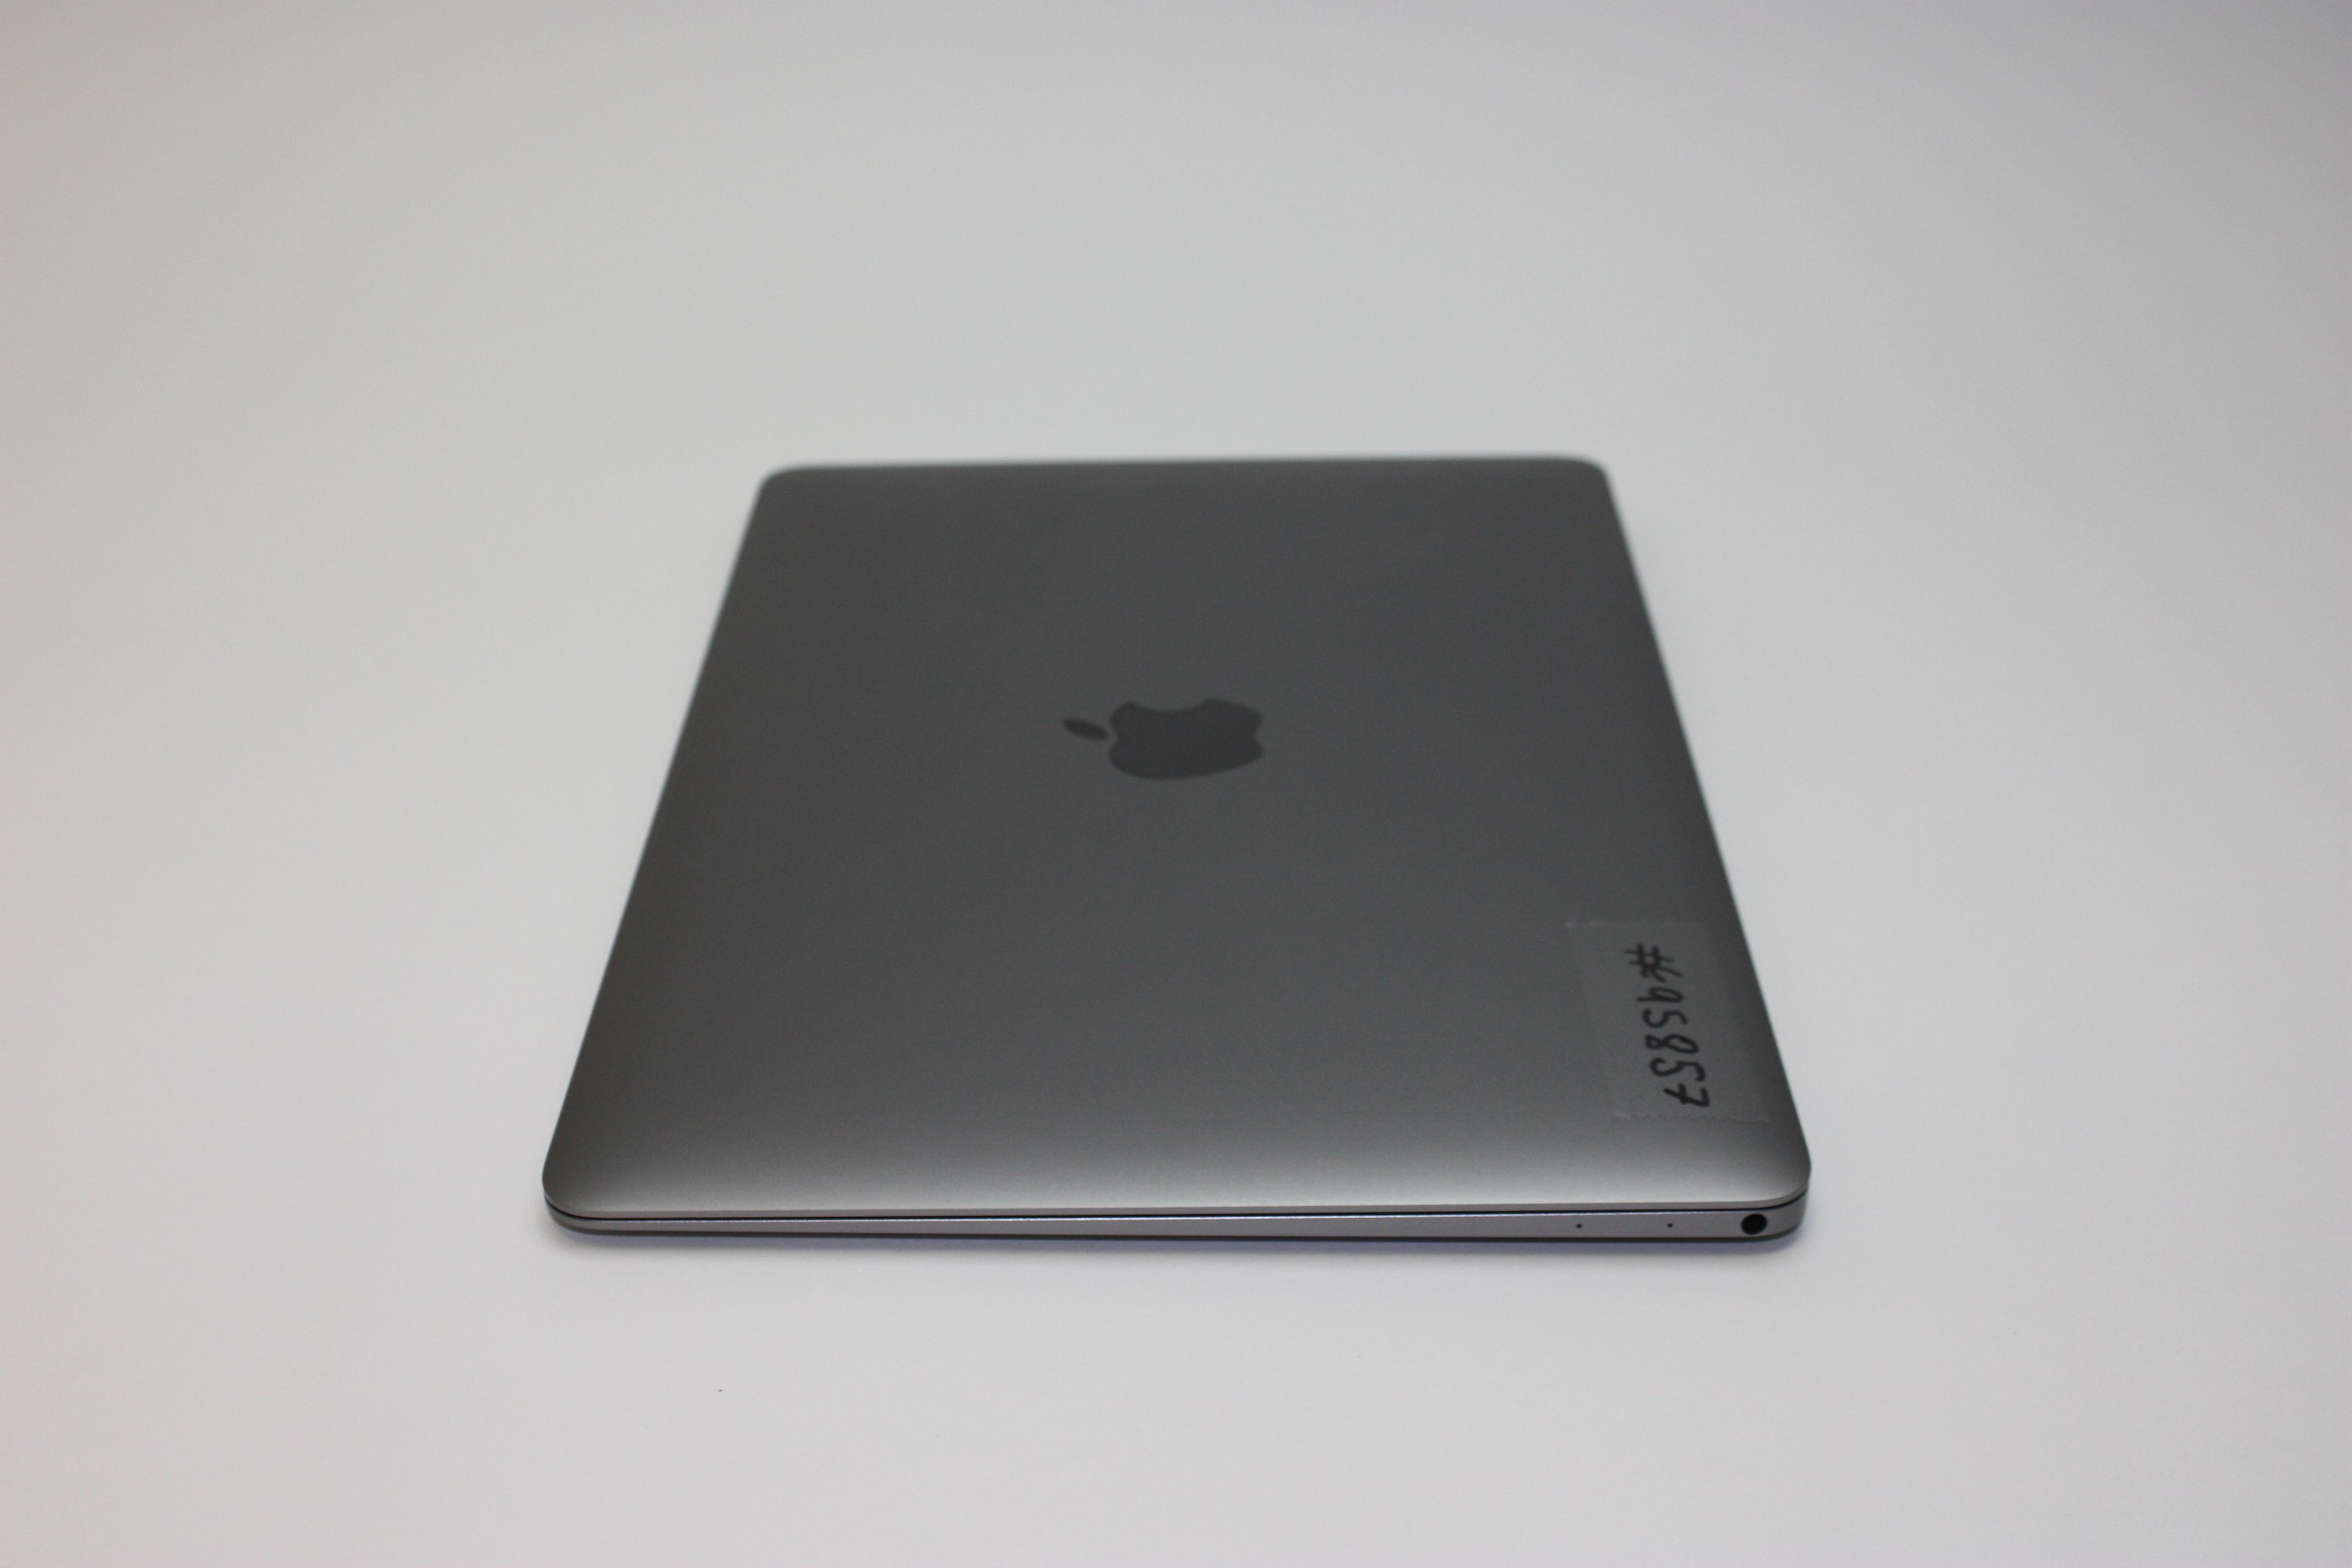 MacBook 12-inch Retina, 1.3 GHz Intel Core M, 8 GB 1600 MHz DDR3, 500 GB Flash Storage, Product age: 29 months, image 7